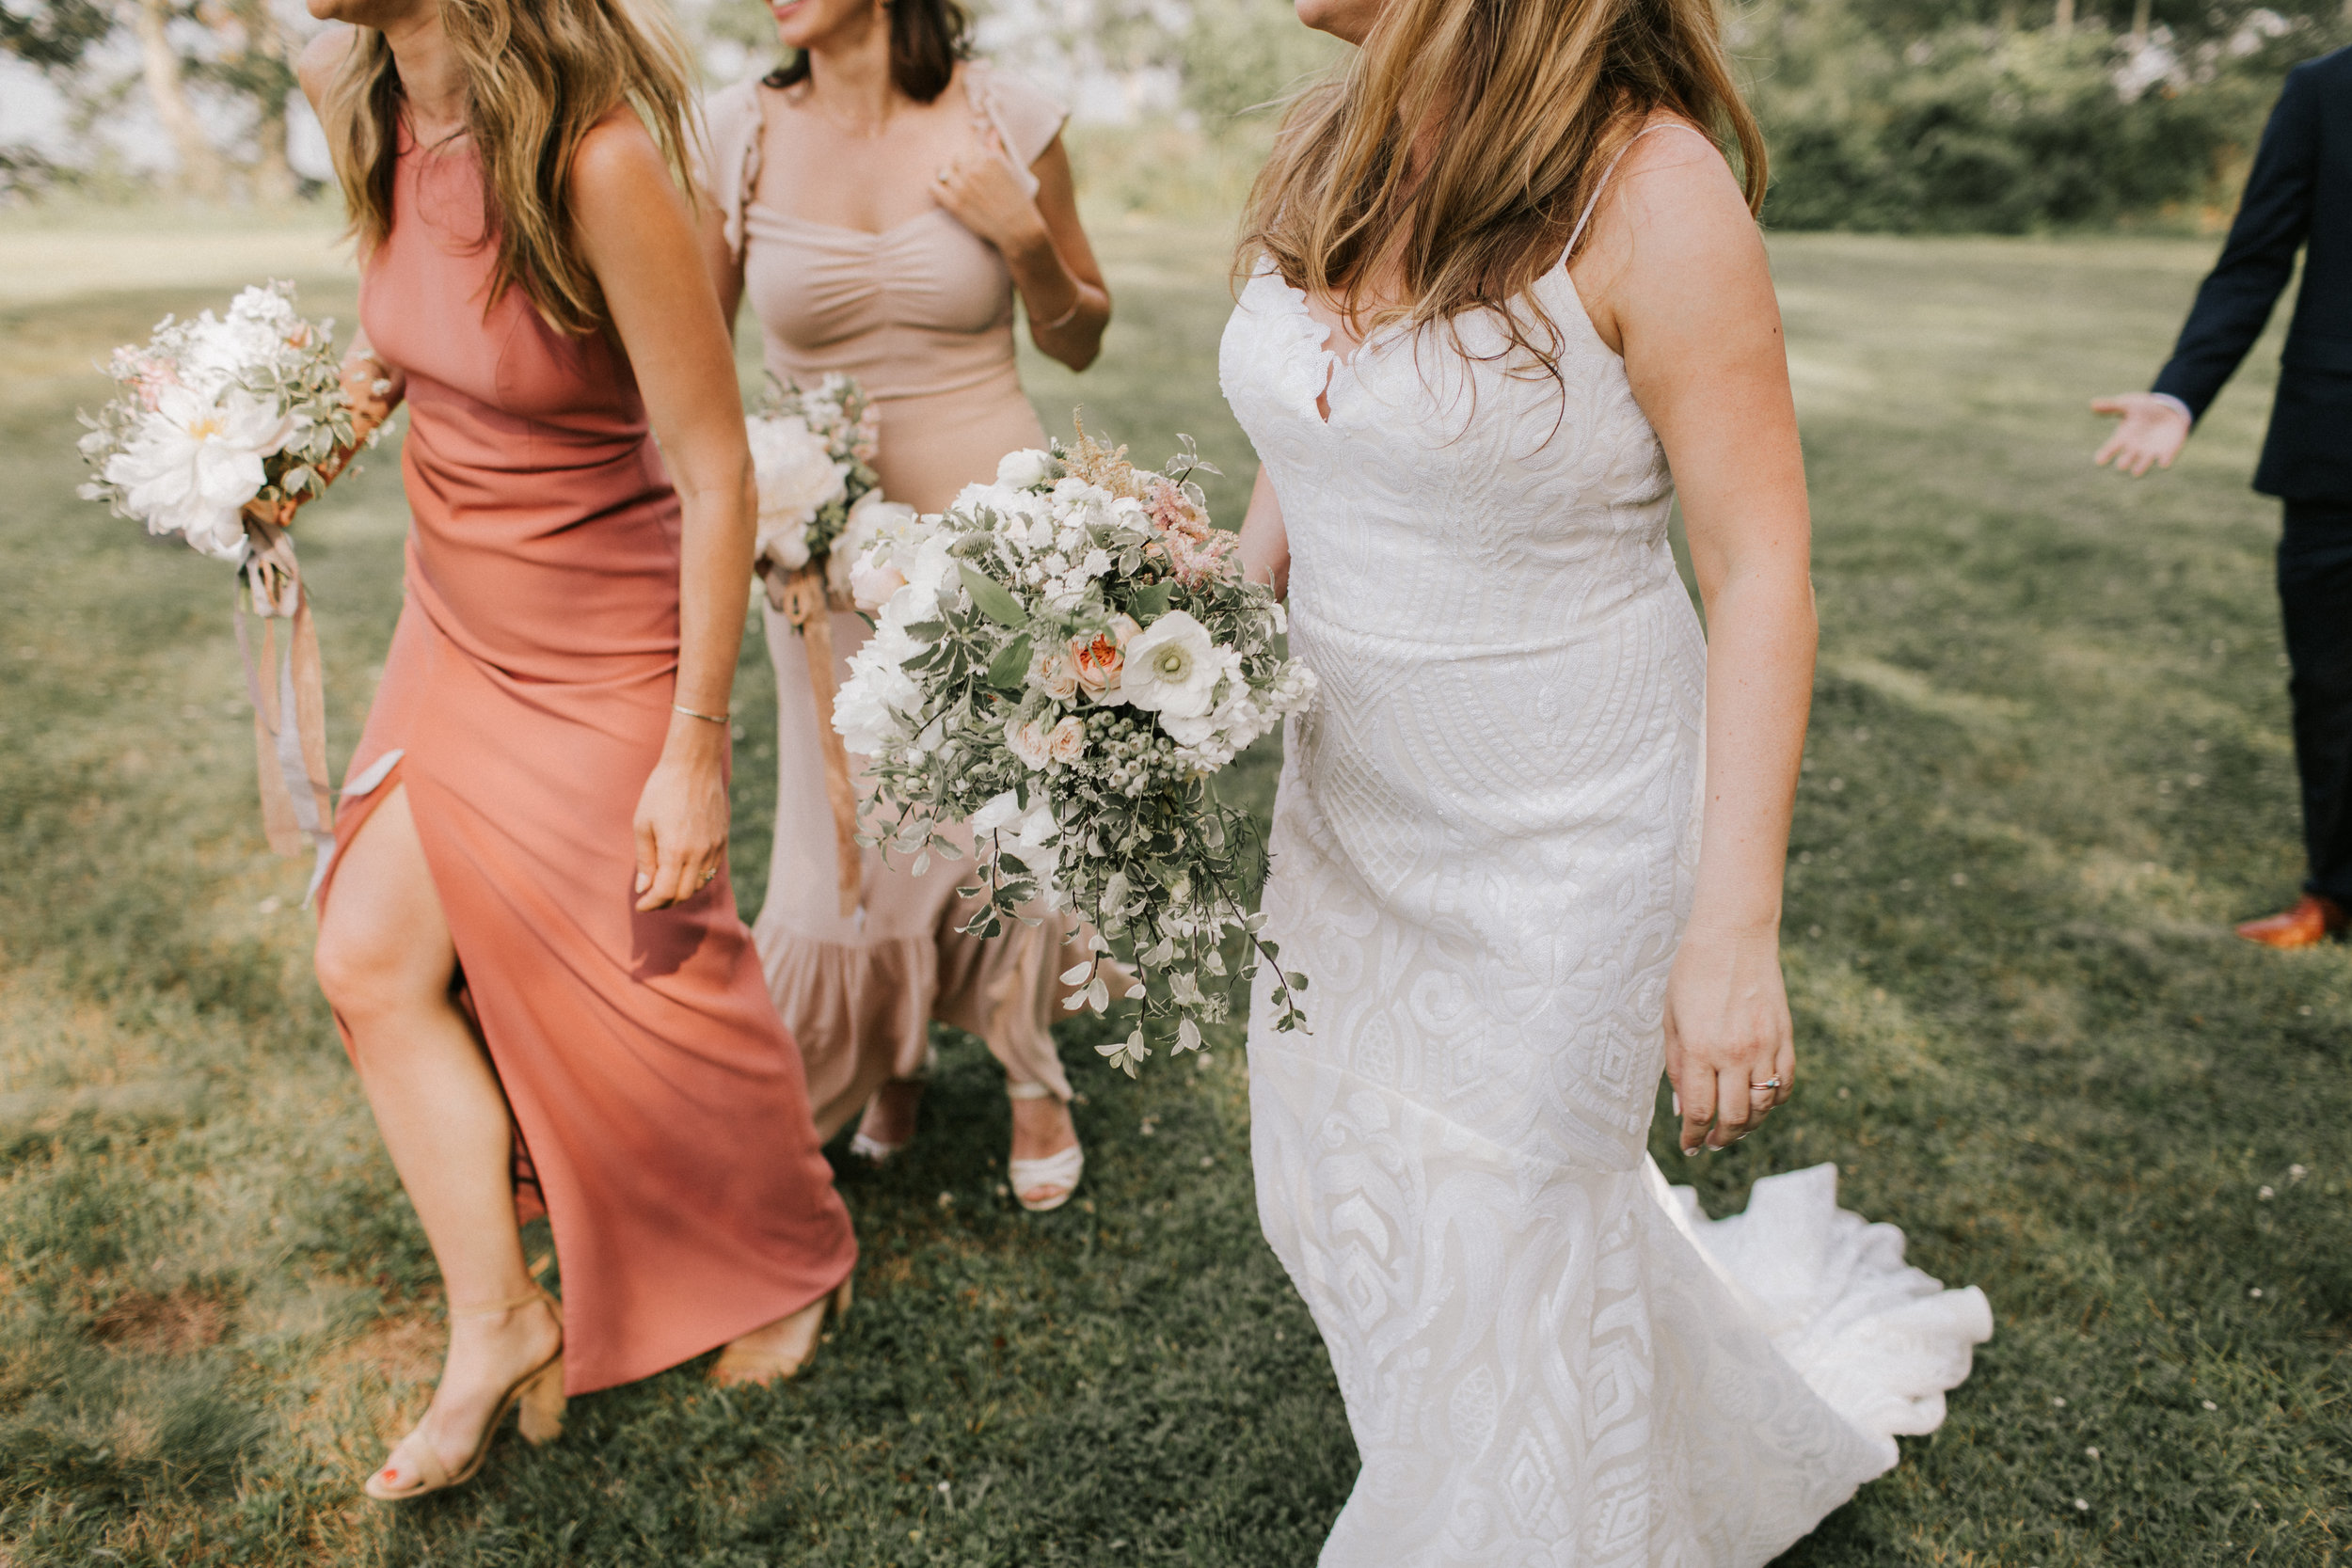 Watershed_Floral_Marianmade_Farm_Wedding_JamieMercurioPhoto2018-375.jpg